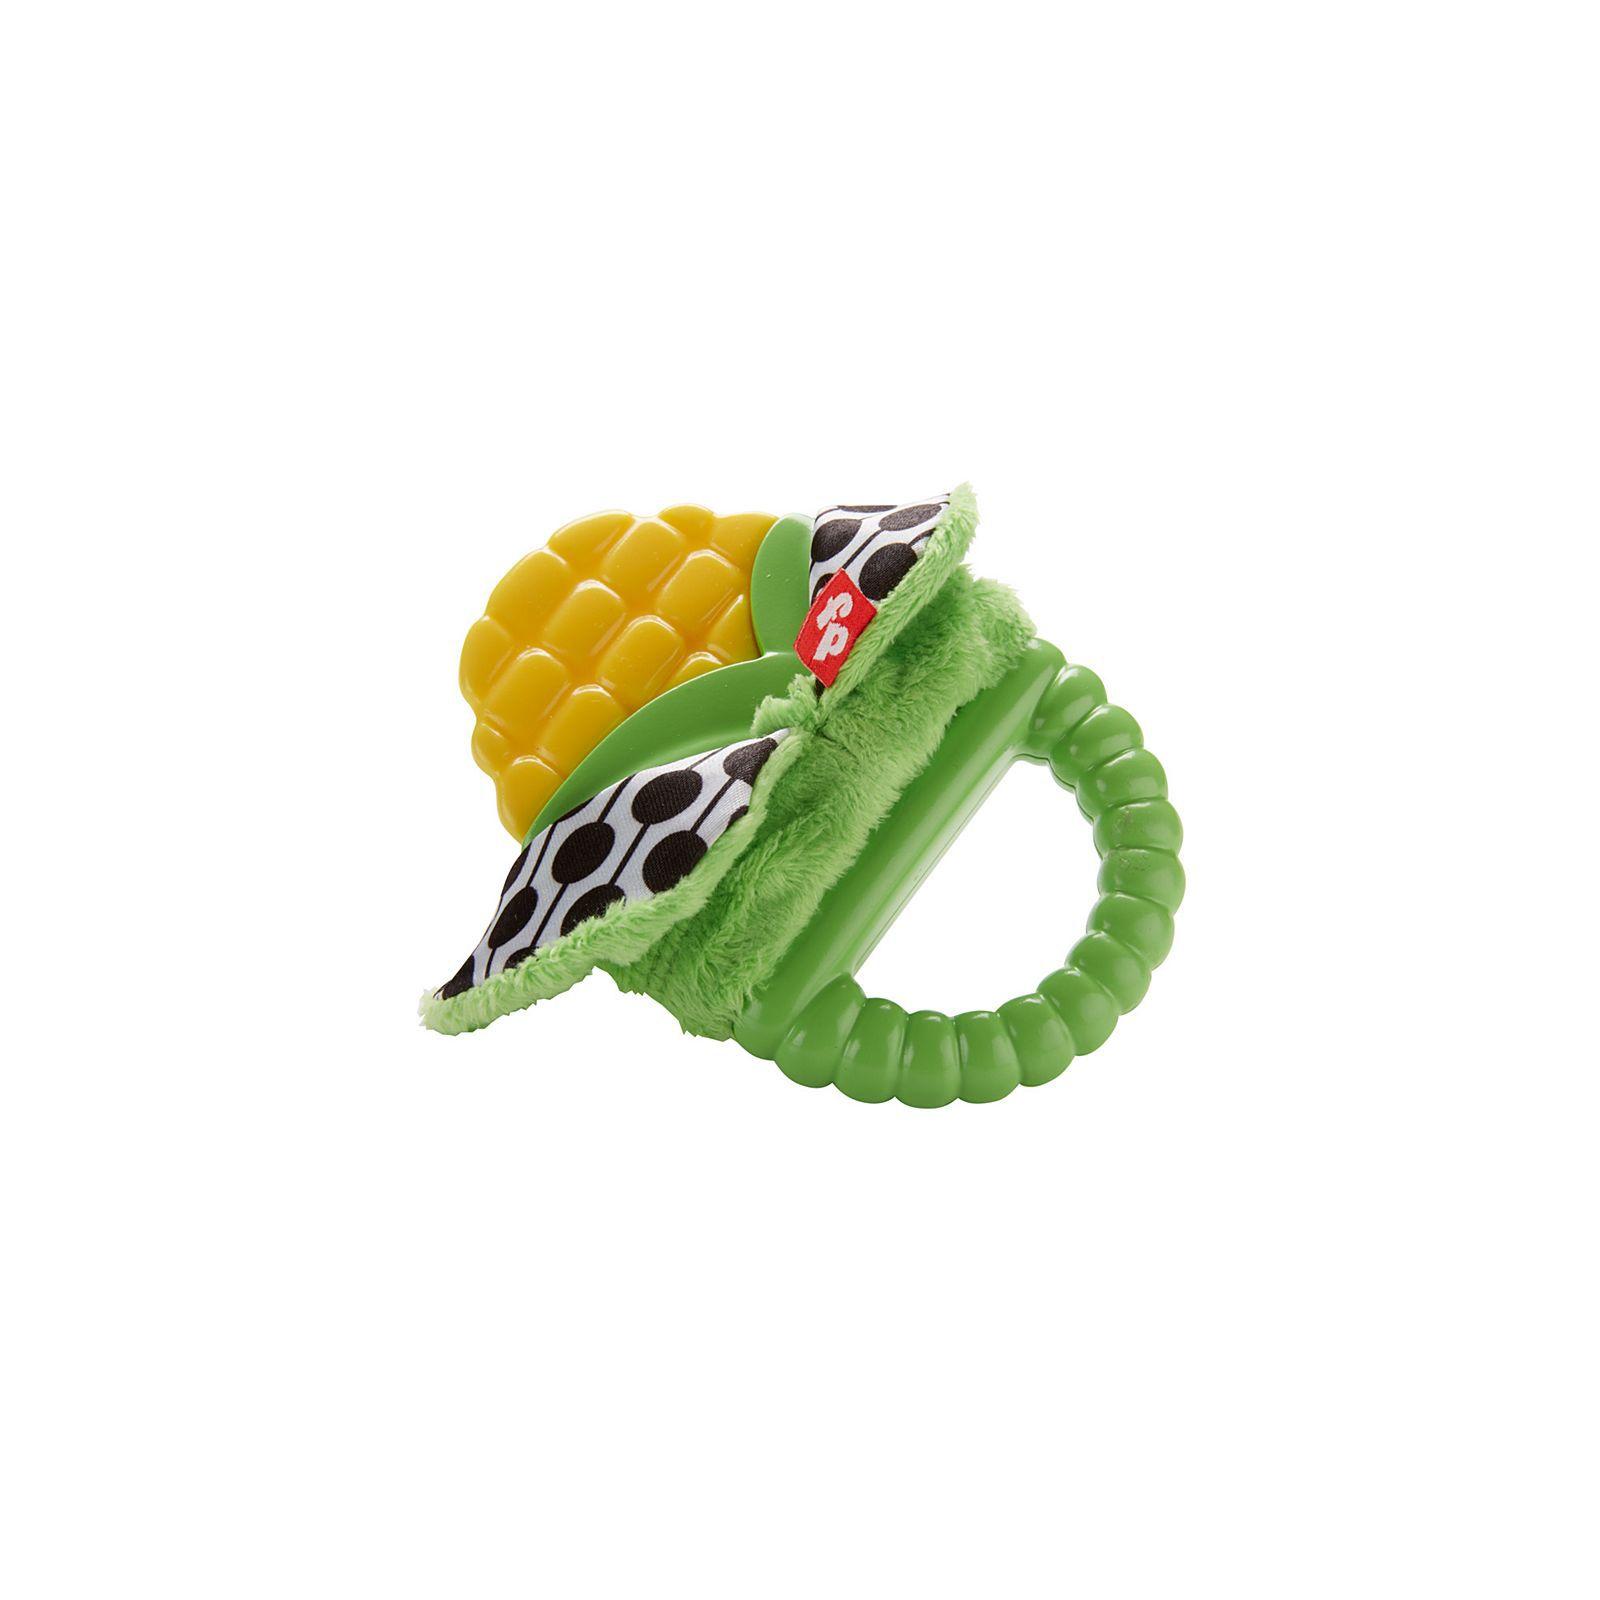 Fisher Price Mordedor De Silicone Milho Verde DRD85 Mattel